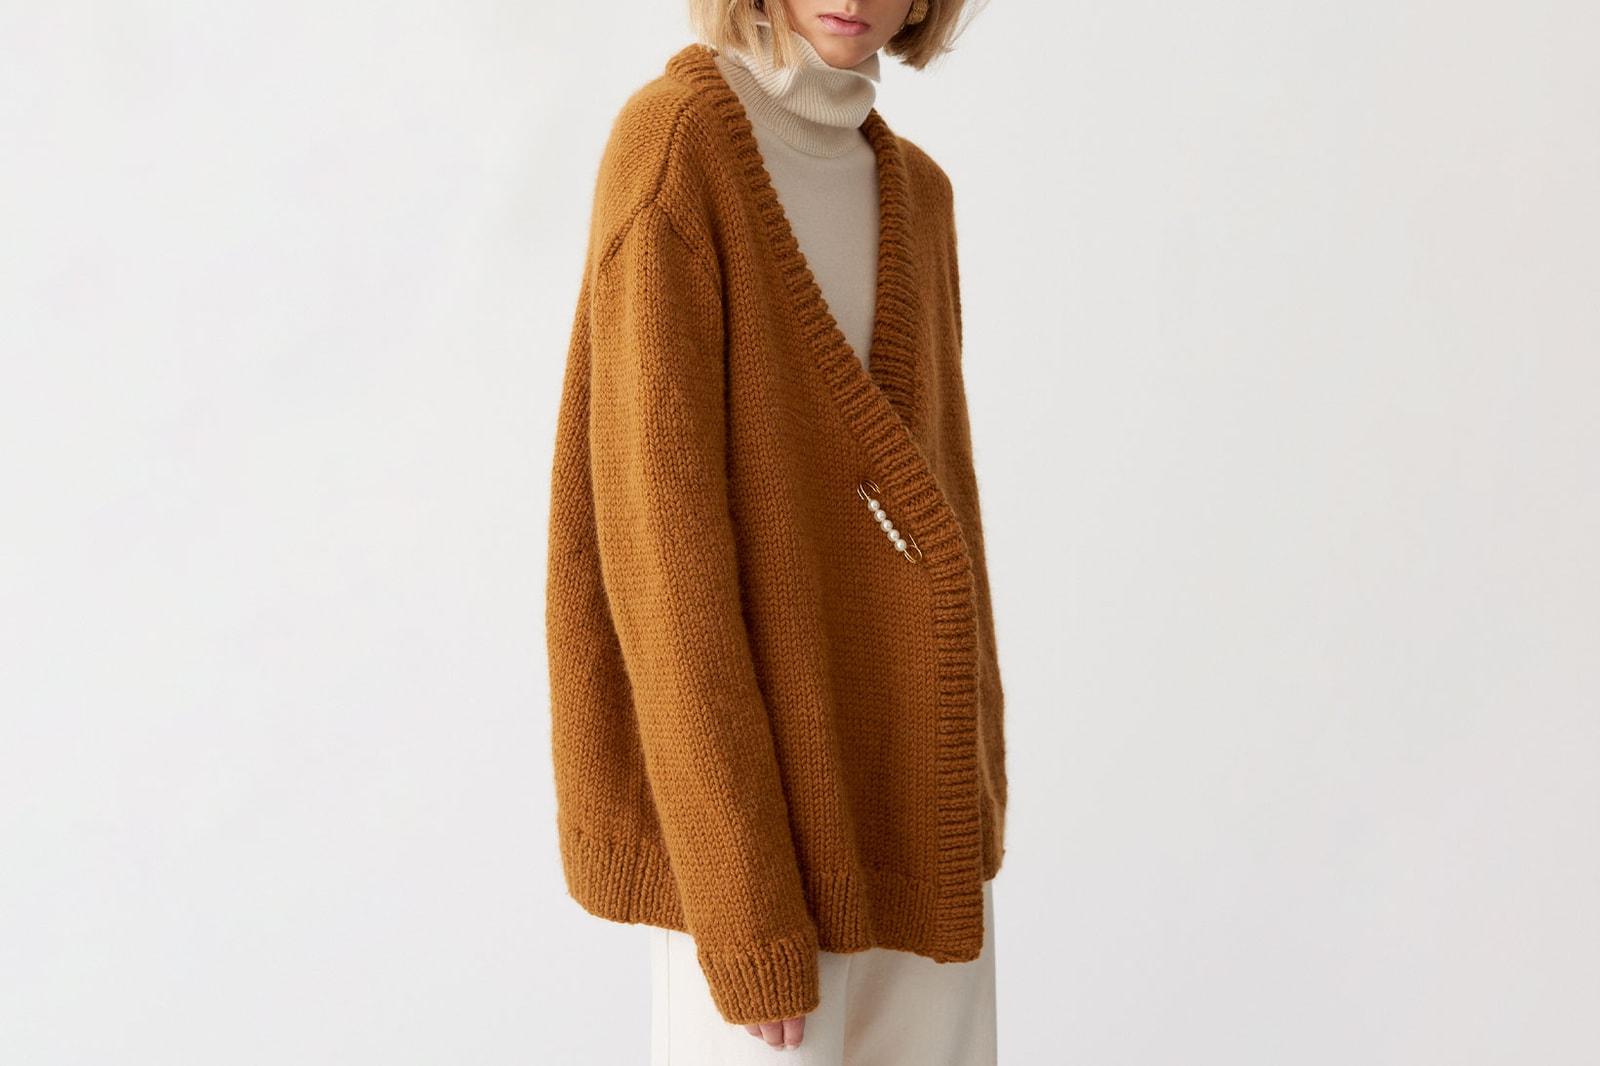 Glamorous Sweater Fashion Ads : Barrie Knitwear Fall 2014